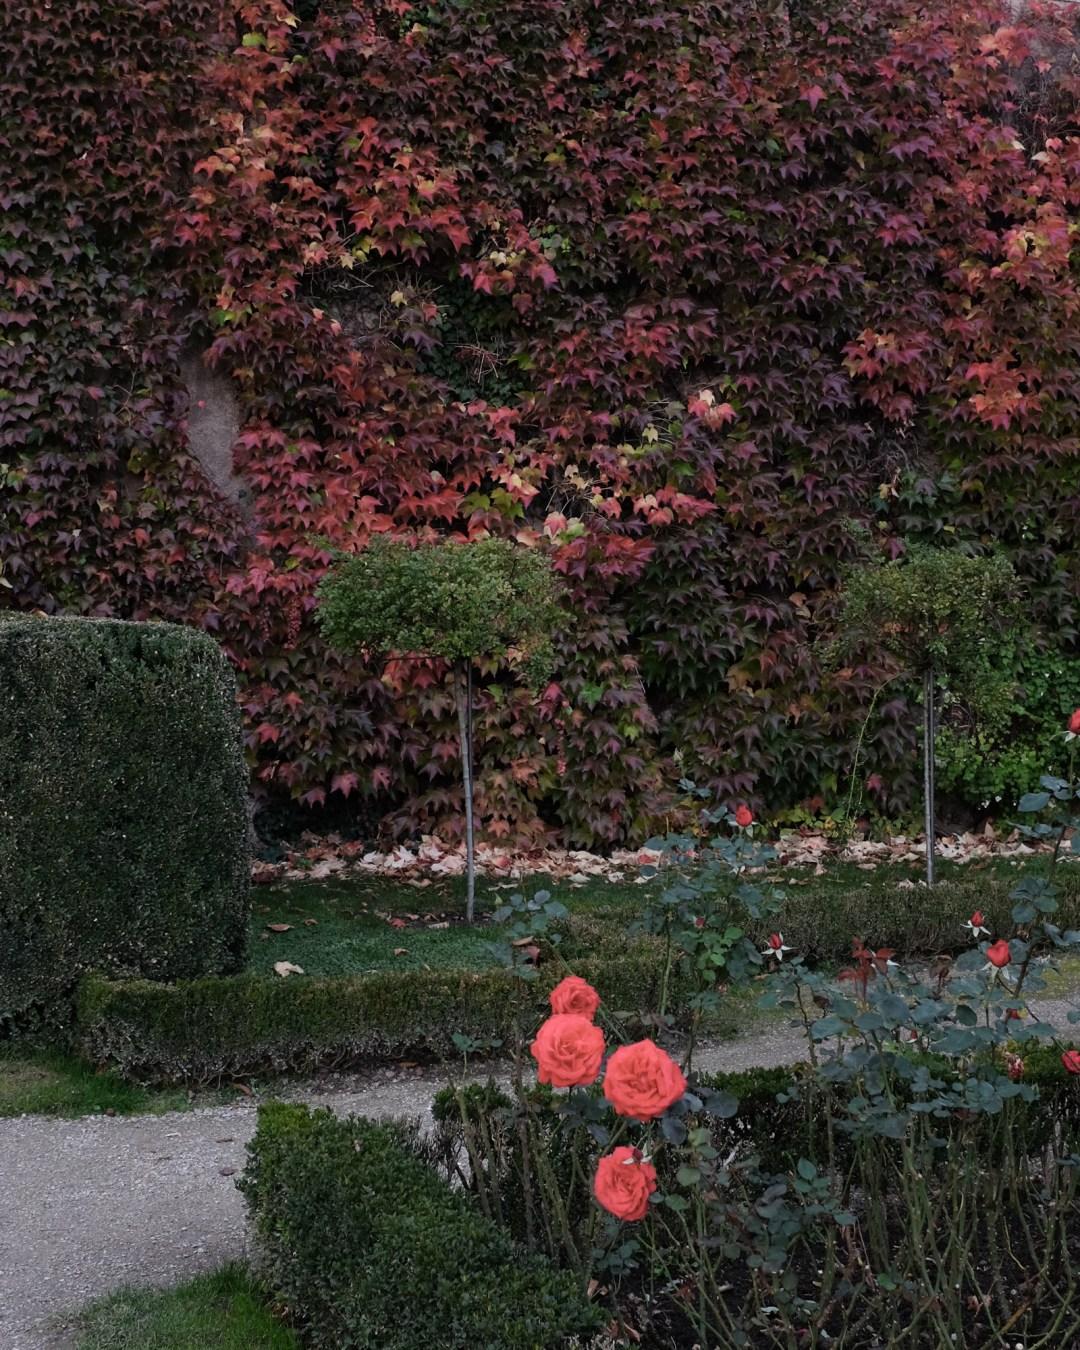 DSCF0240.mirabellgarten herbstfarben autumncolours